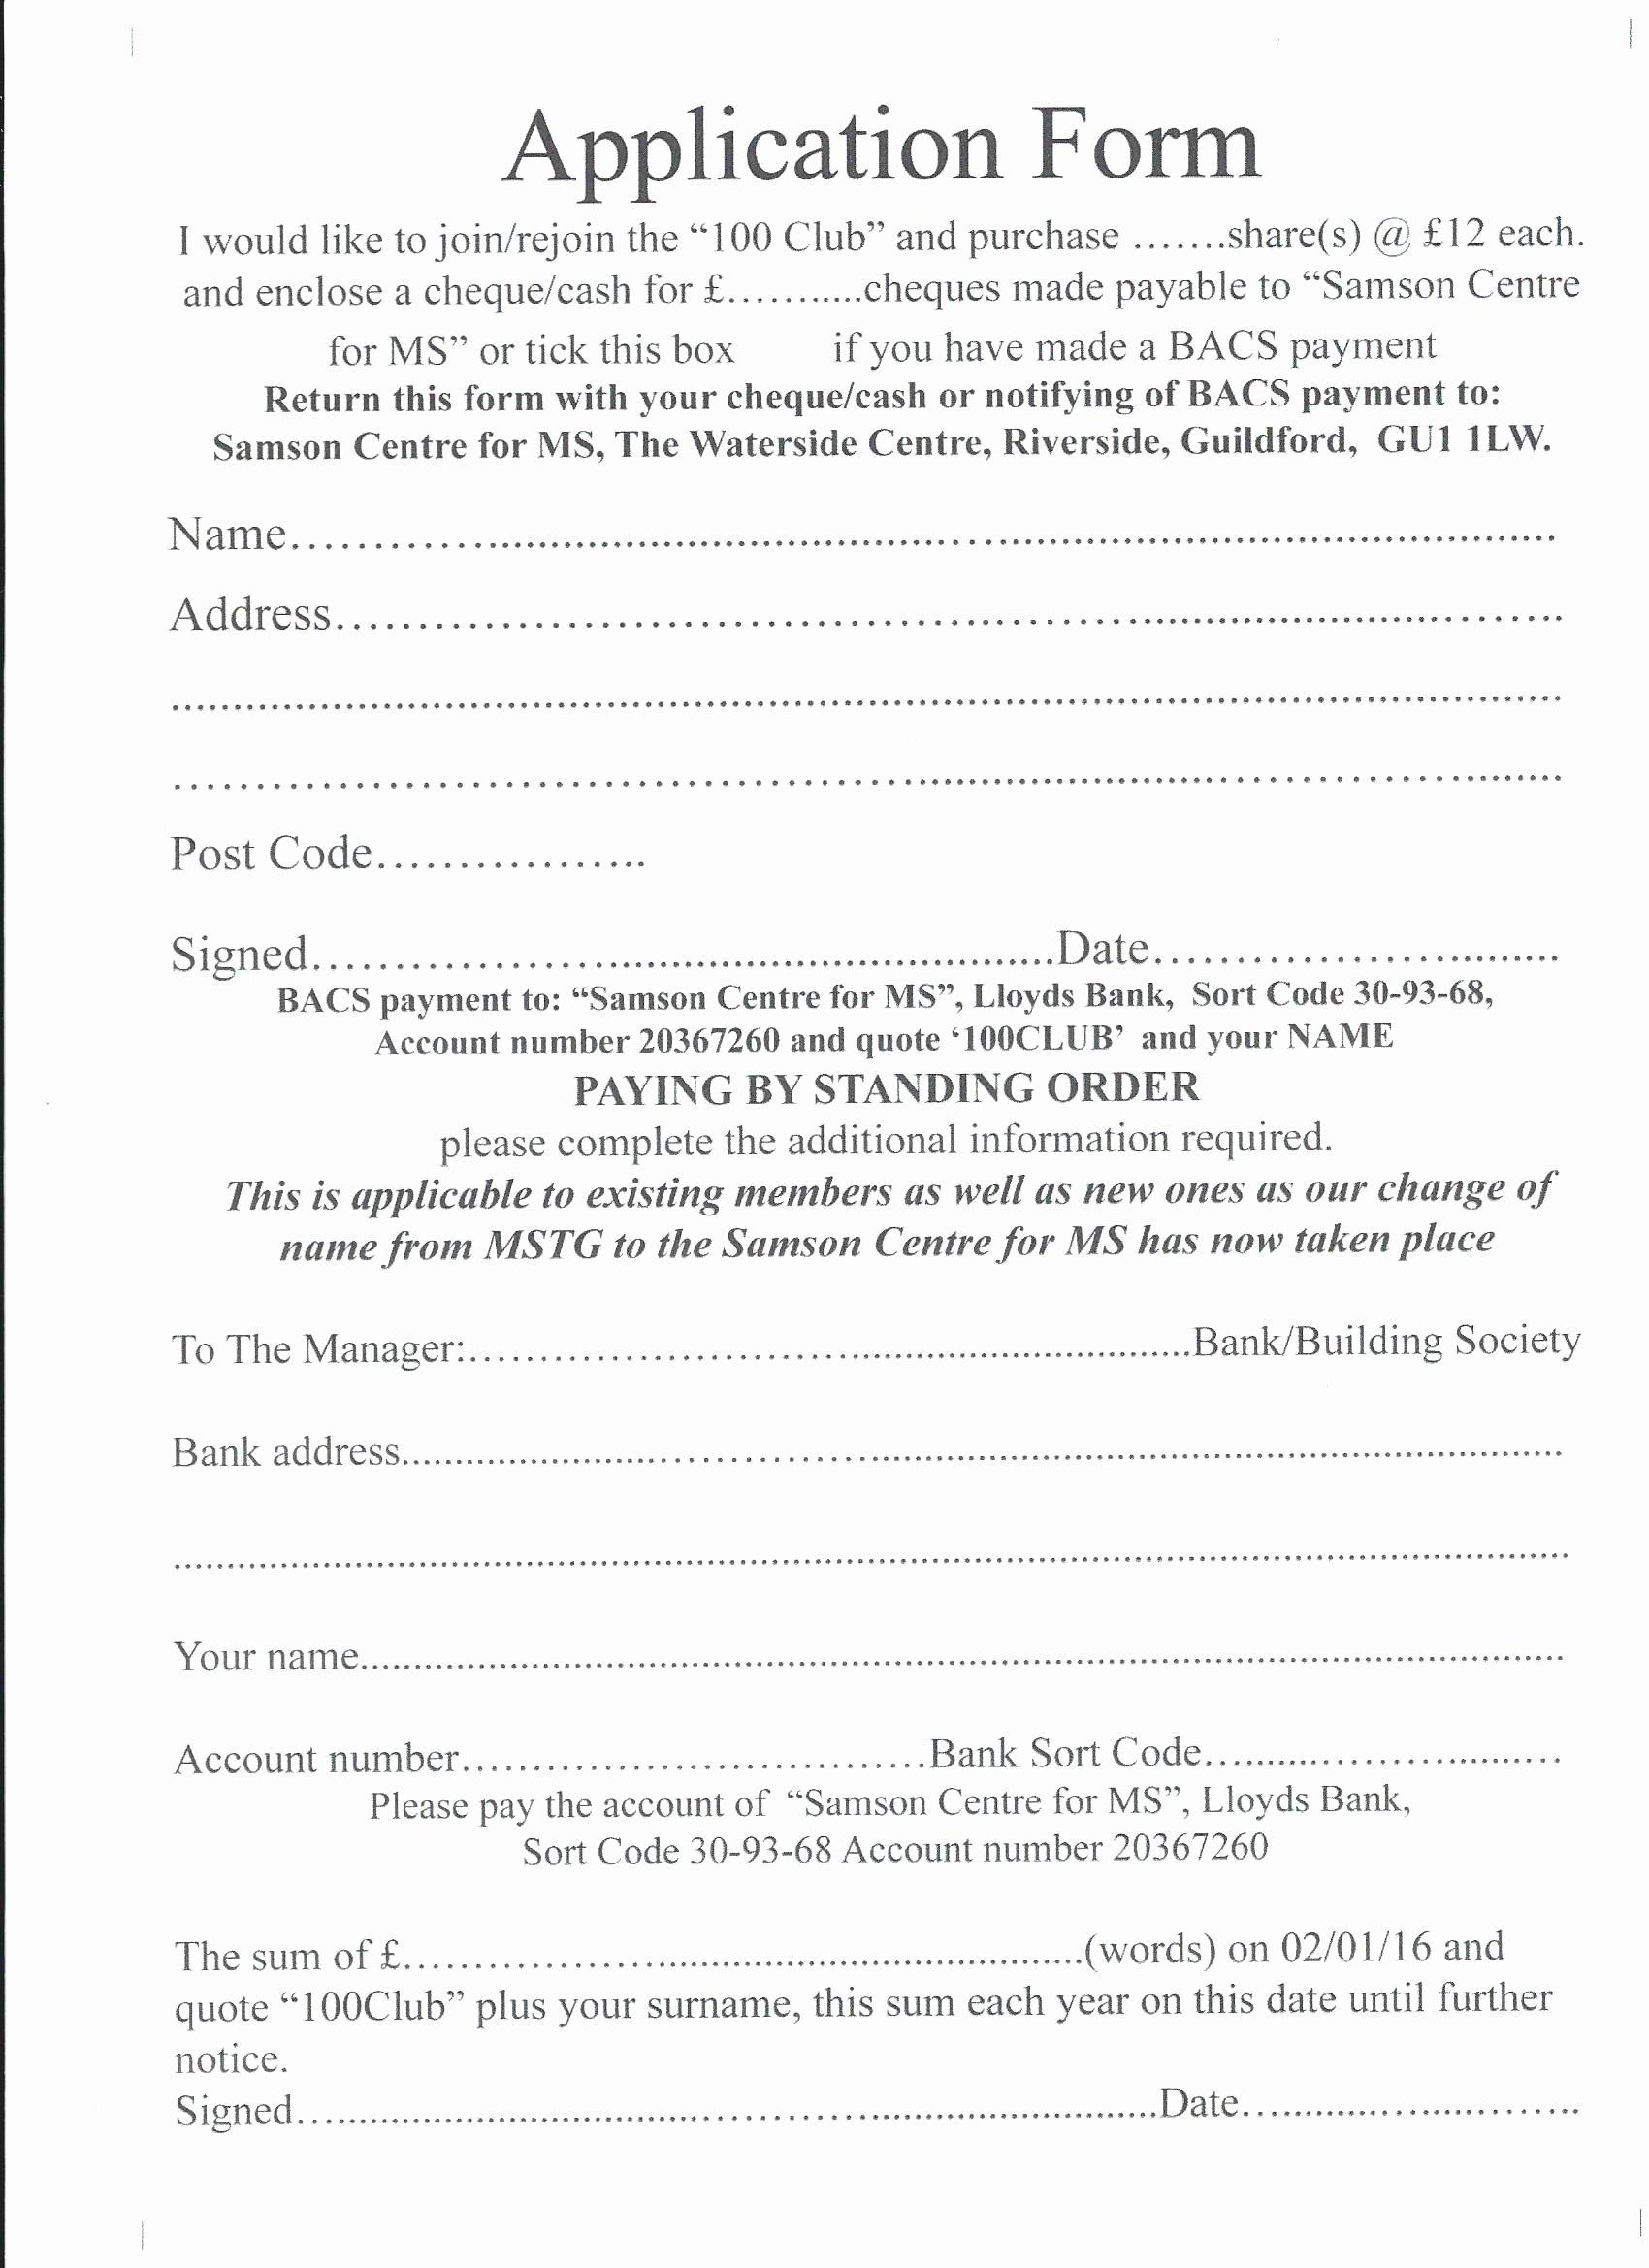 Motorcycle Club Application form Elegant the 100 Club Application form Samson Centre for Ms